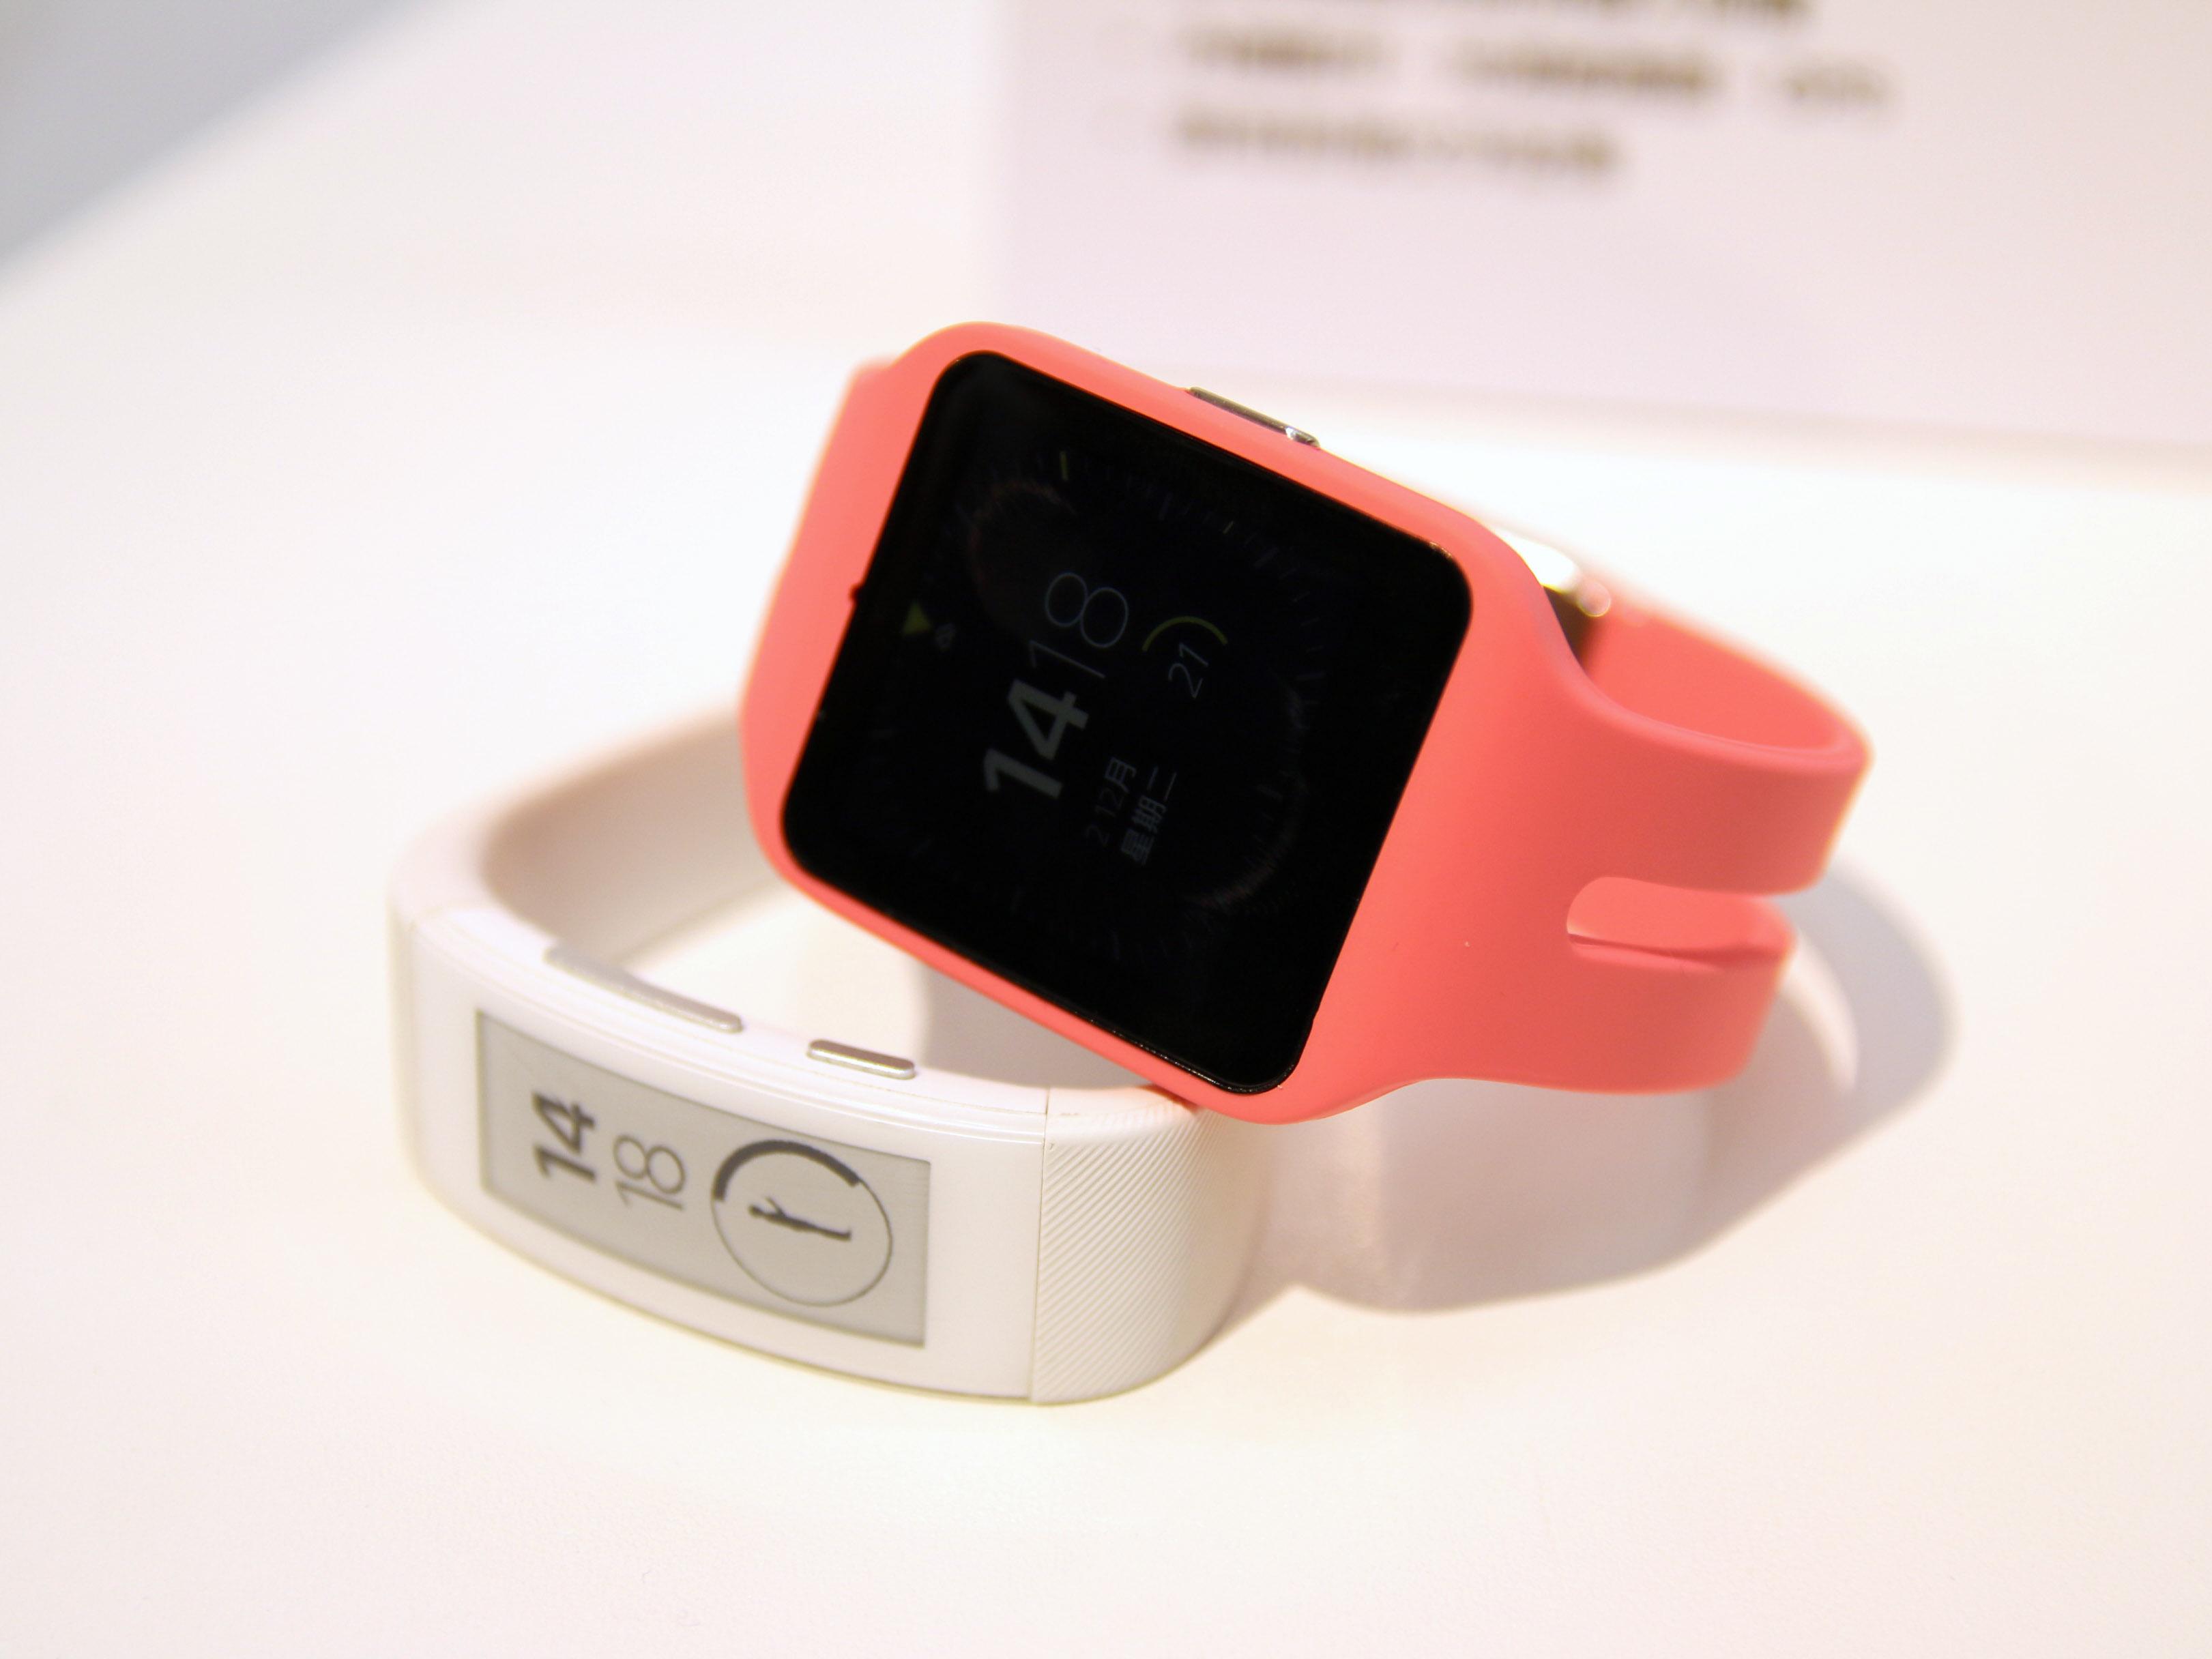 Sony 發表搭載 Android Wear 系統的智慧手錶 SmartWatch 3